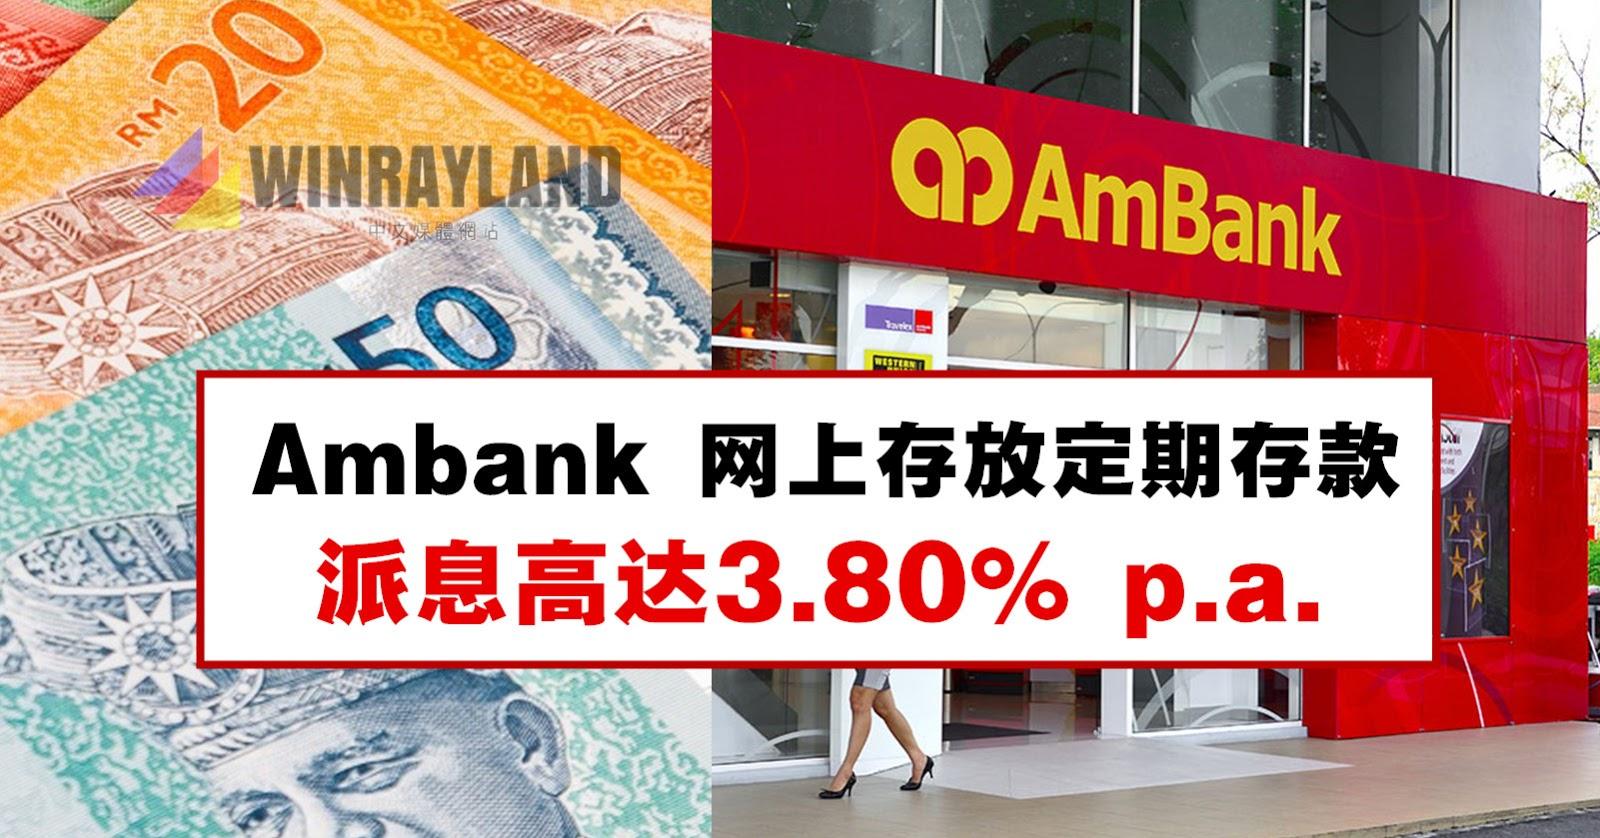 Ambank 网上存放定期存款,派息高达3.80% p.a.